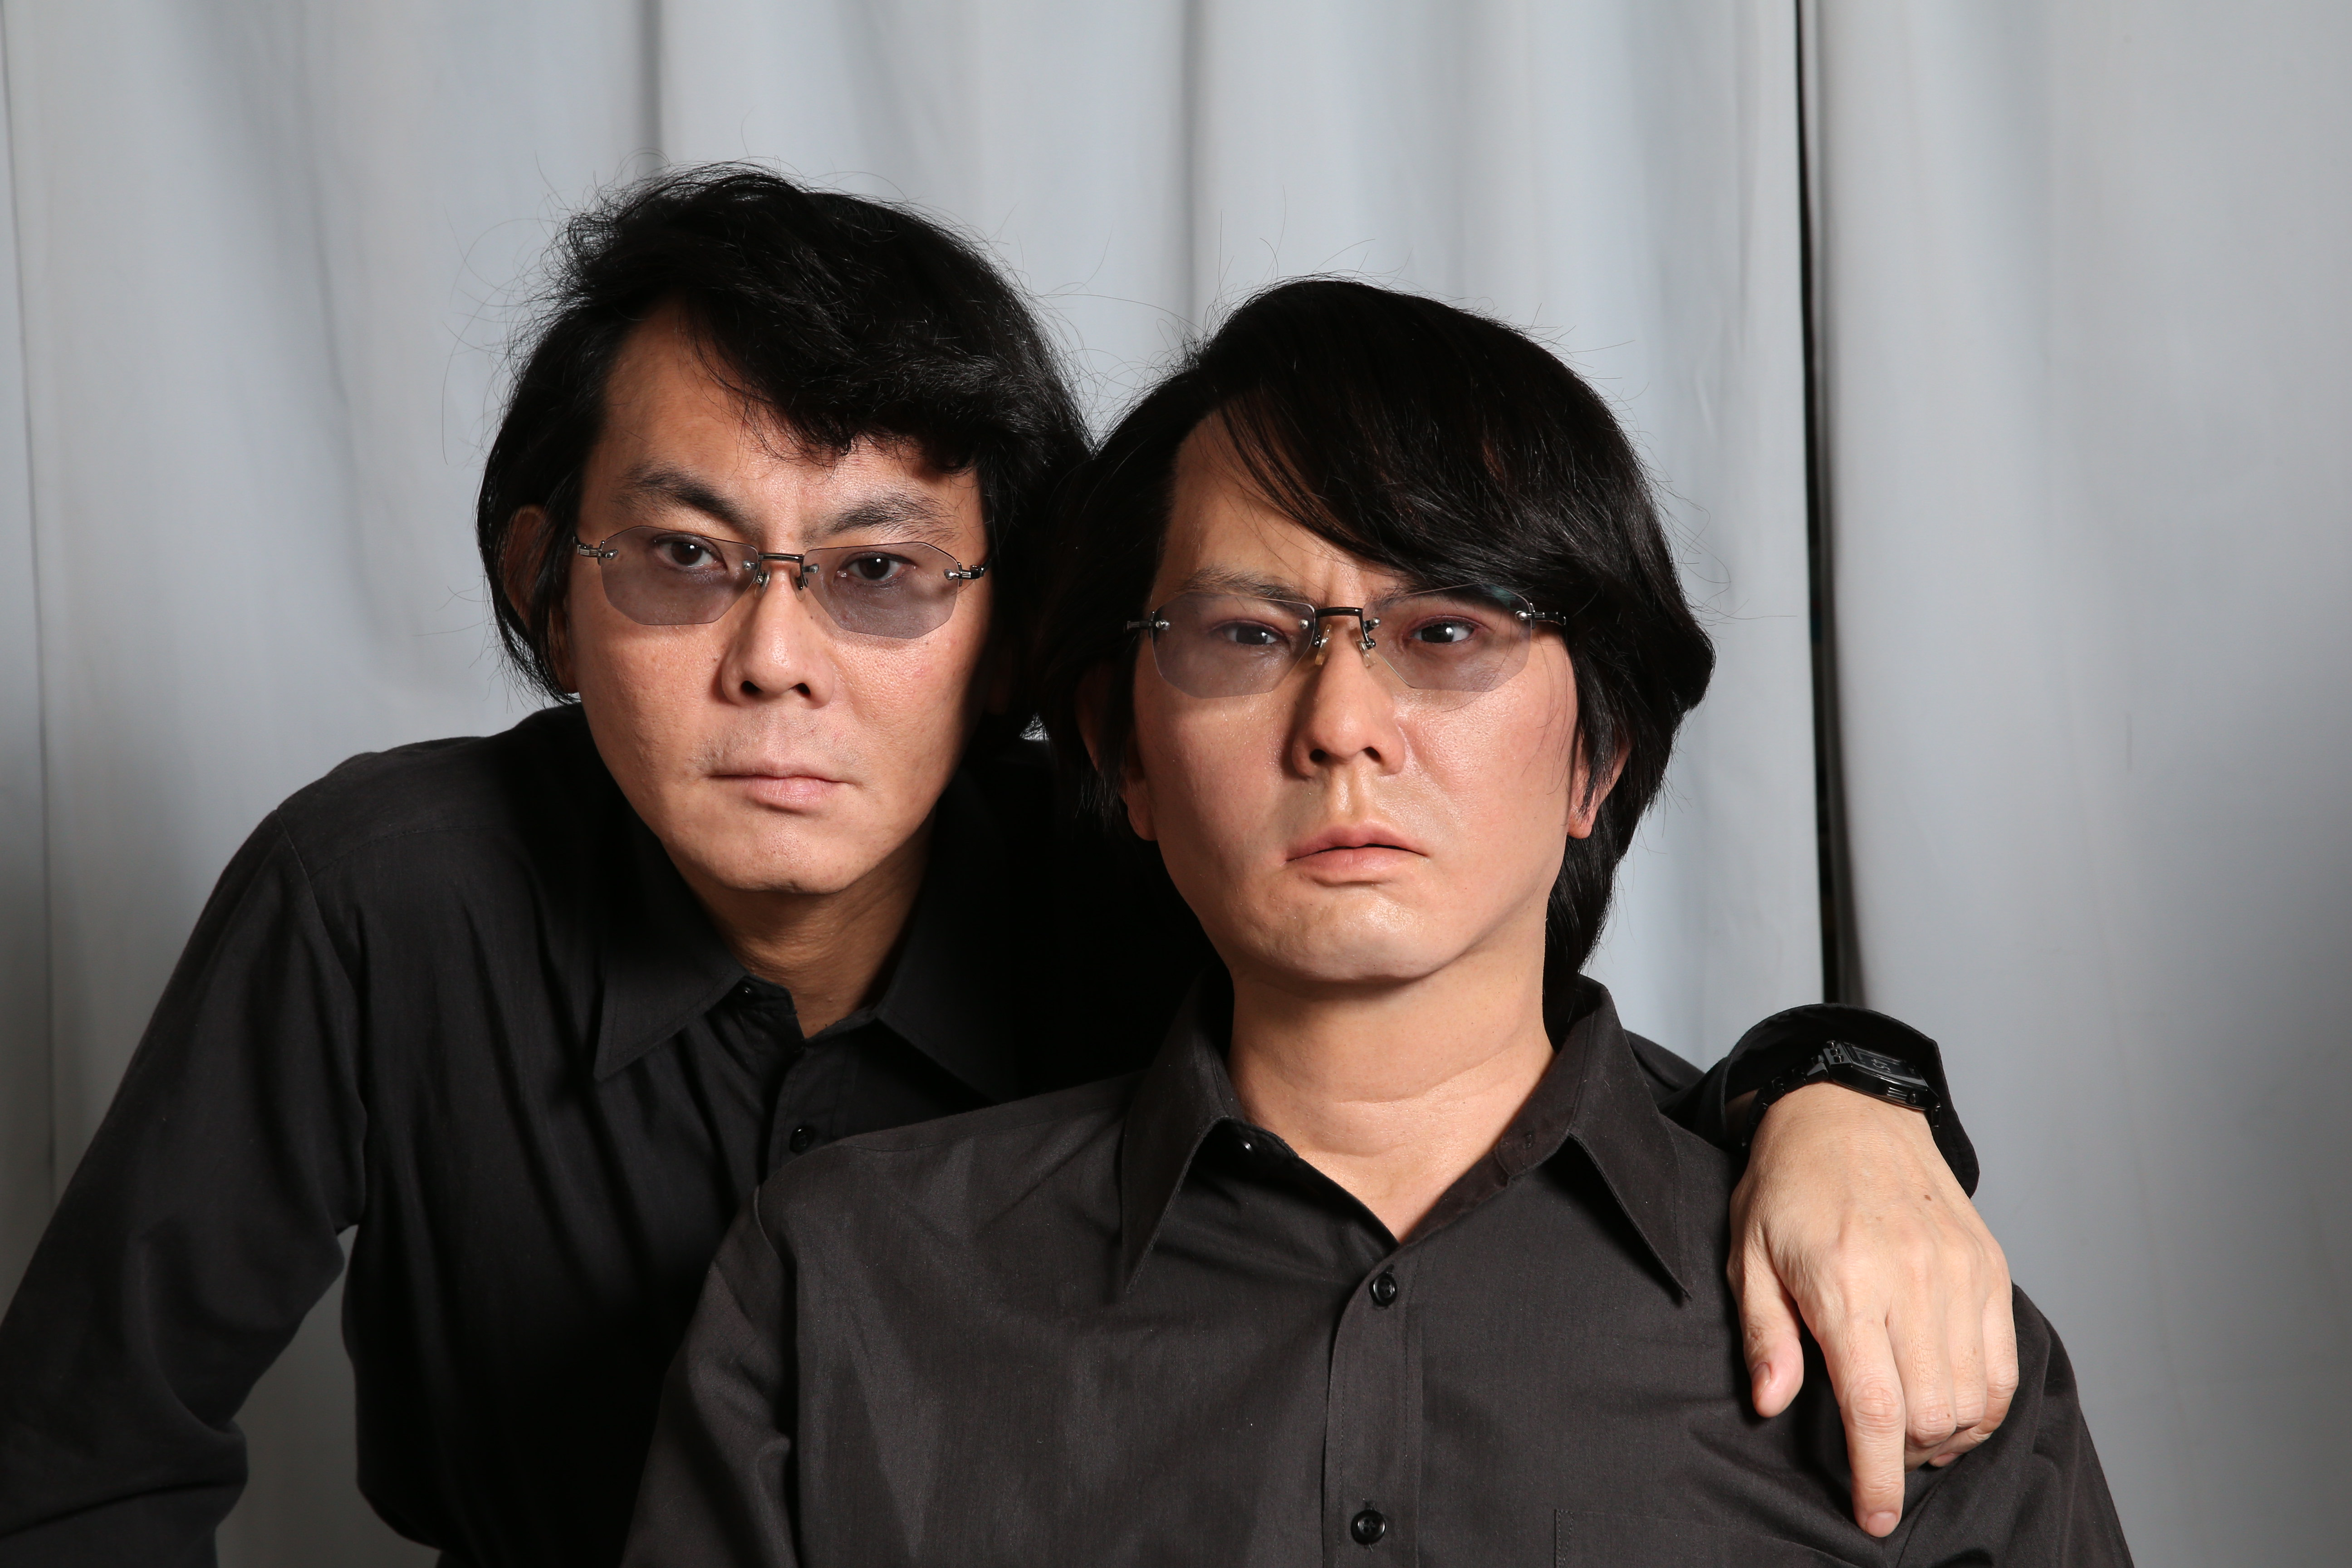 ATR・大阪大学共同プロジェクト 遠隔操作型アンドロイド「ジェミノイド(R)」の音声にエーアイの音声合成AITalk(R)が採用